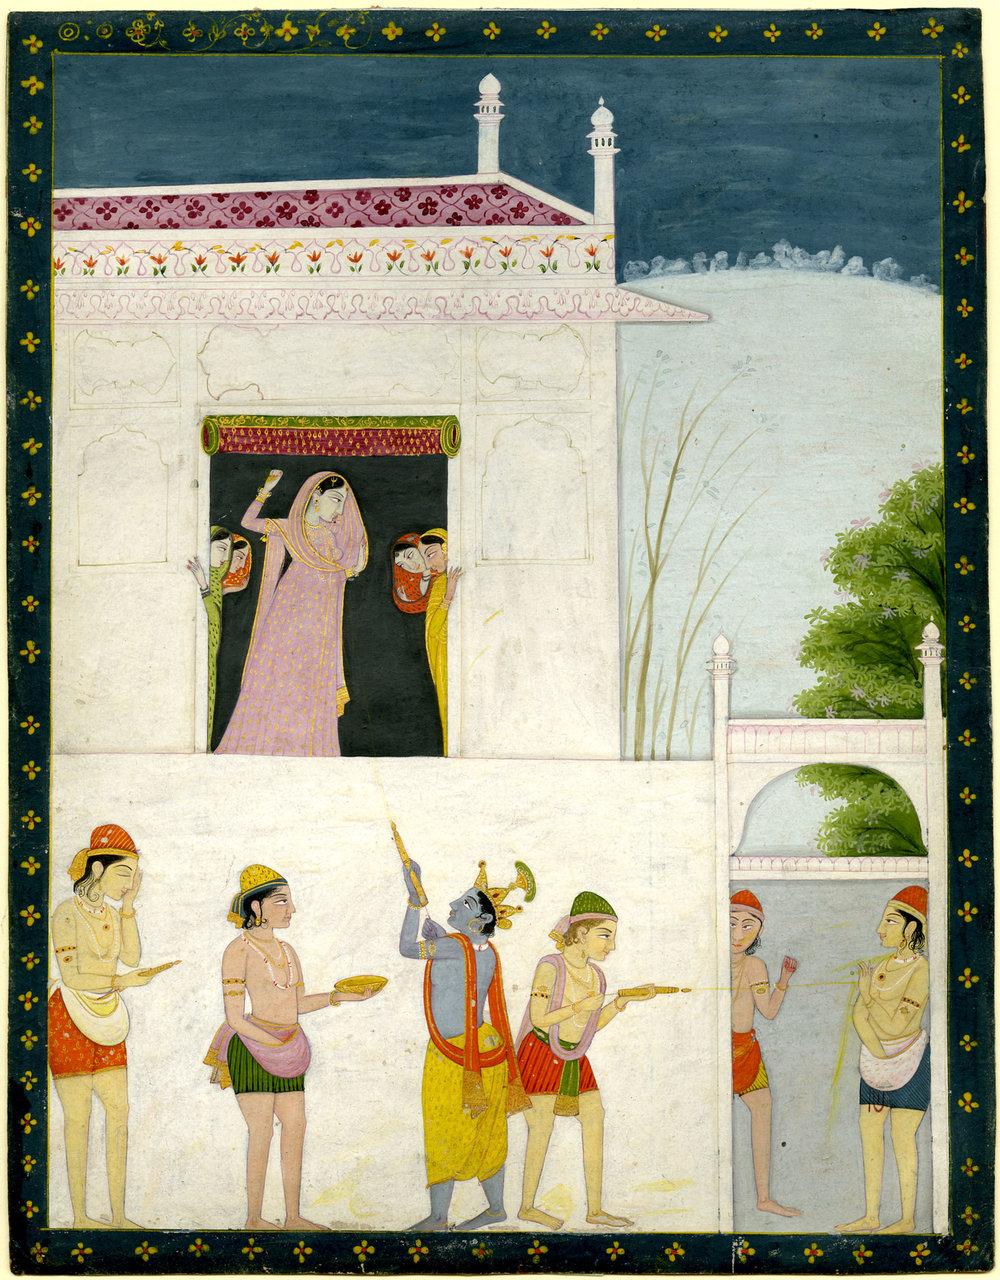 Krishna squirting coloured water at Radha.  Painting, Pahari School, early 19th century.